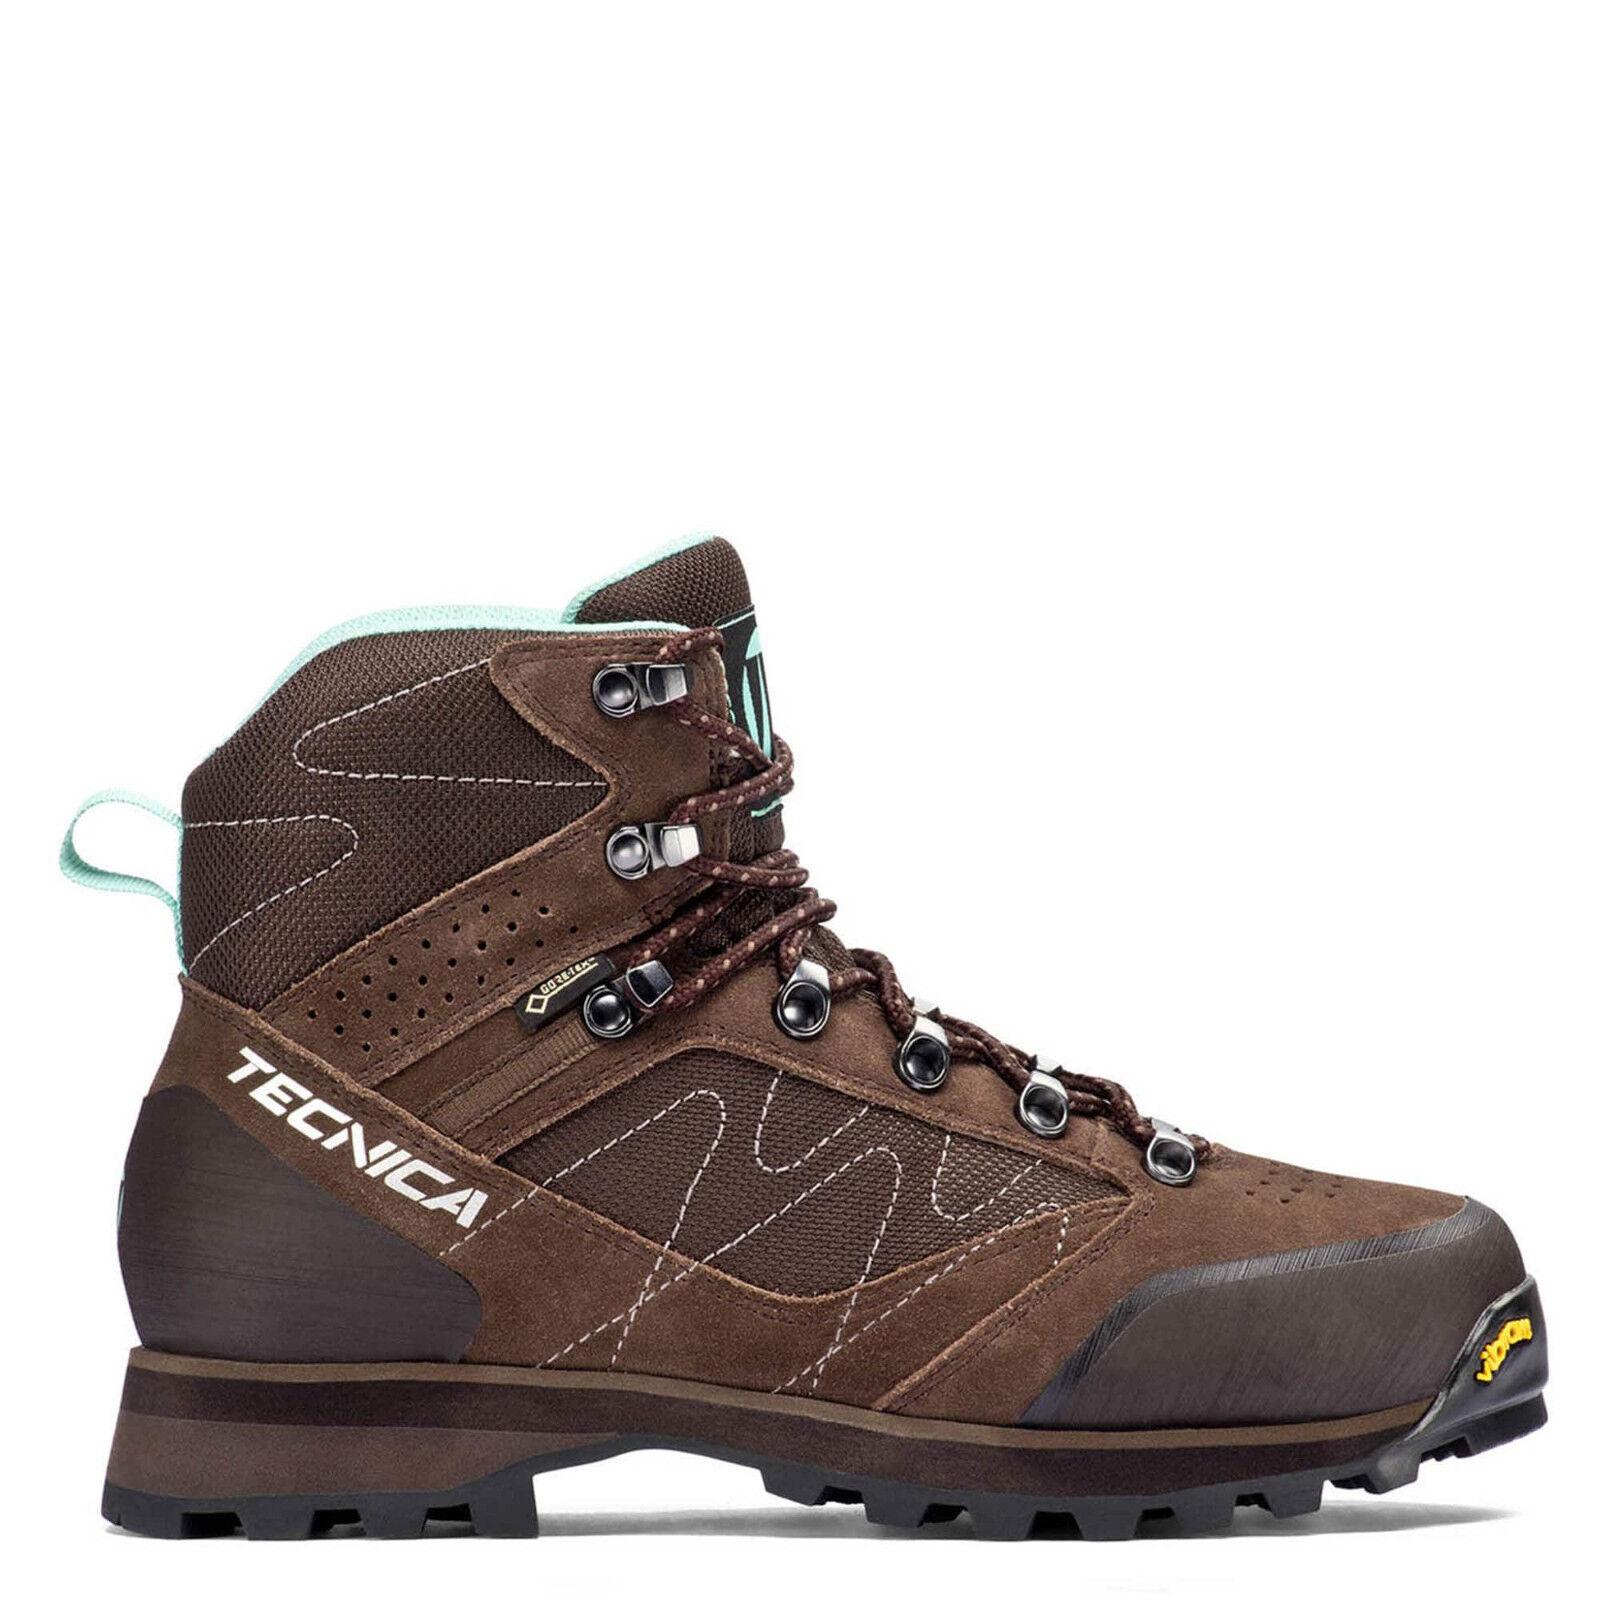 Tecnica kilimanjaro II GTX trekking shoe Gr. 38 eu us  7 brown  2018 latest